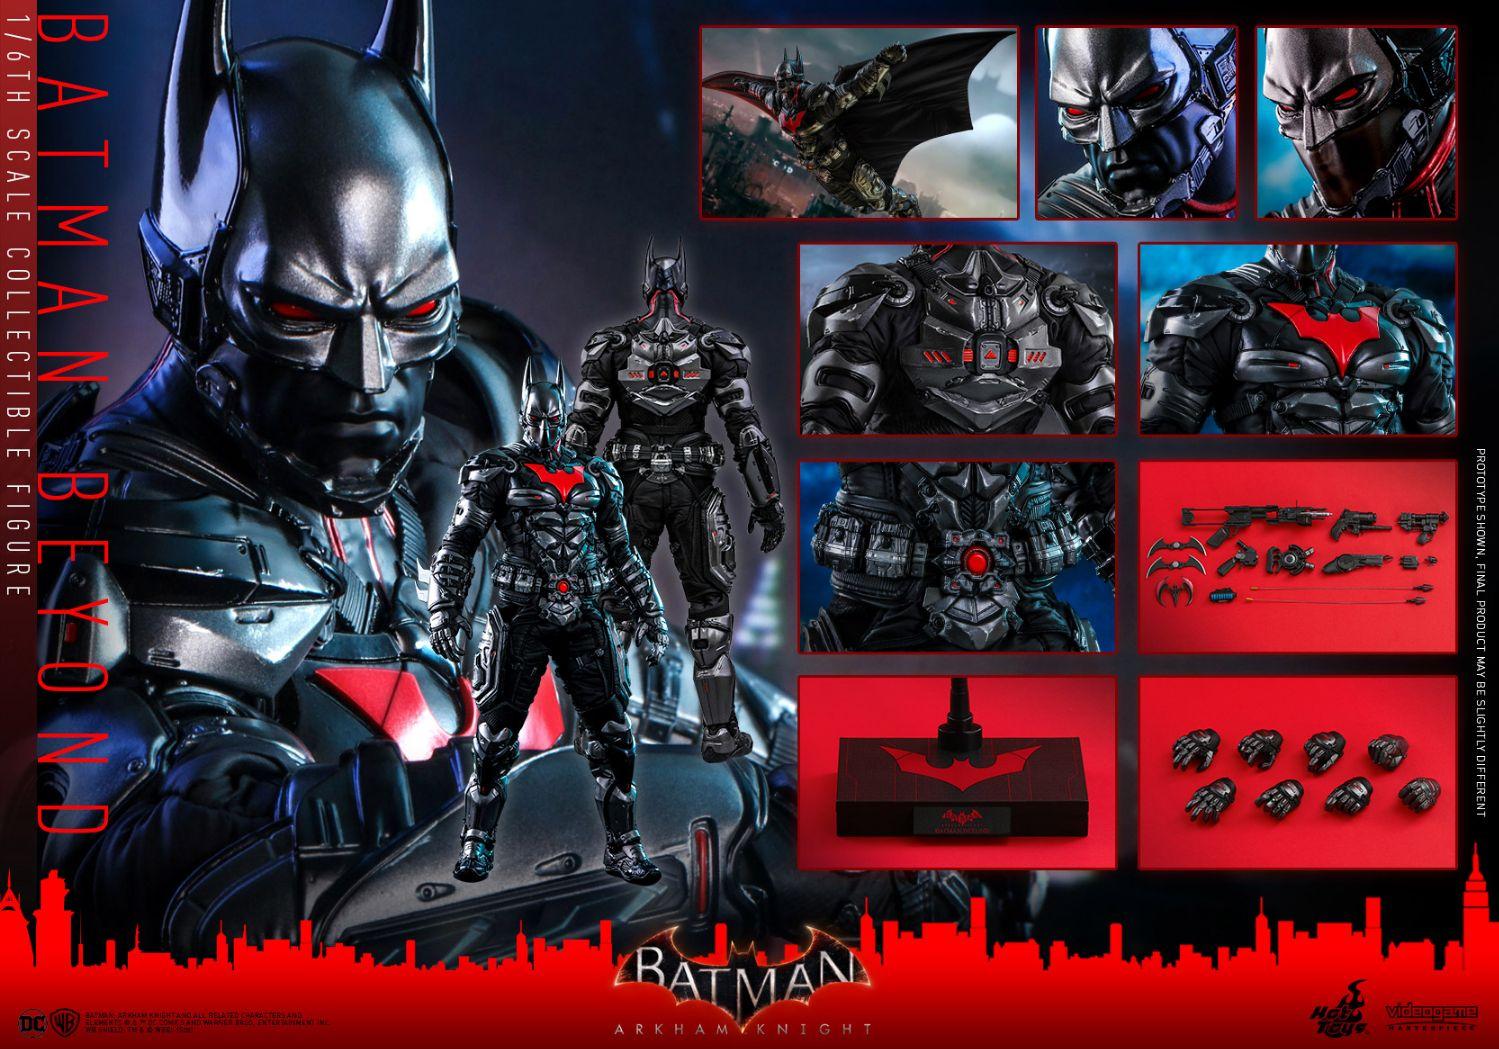 Hottoys ホットトイズ VGM 39 バットマン:アーカム 正規認証品!新規格 ナイト バットマン ザ フューチャー 版 - 完売 一般流通分 Batman Knight スケールフィギュア 1 6 Beyond Arkham